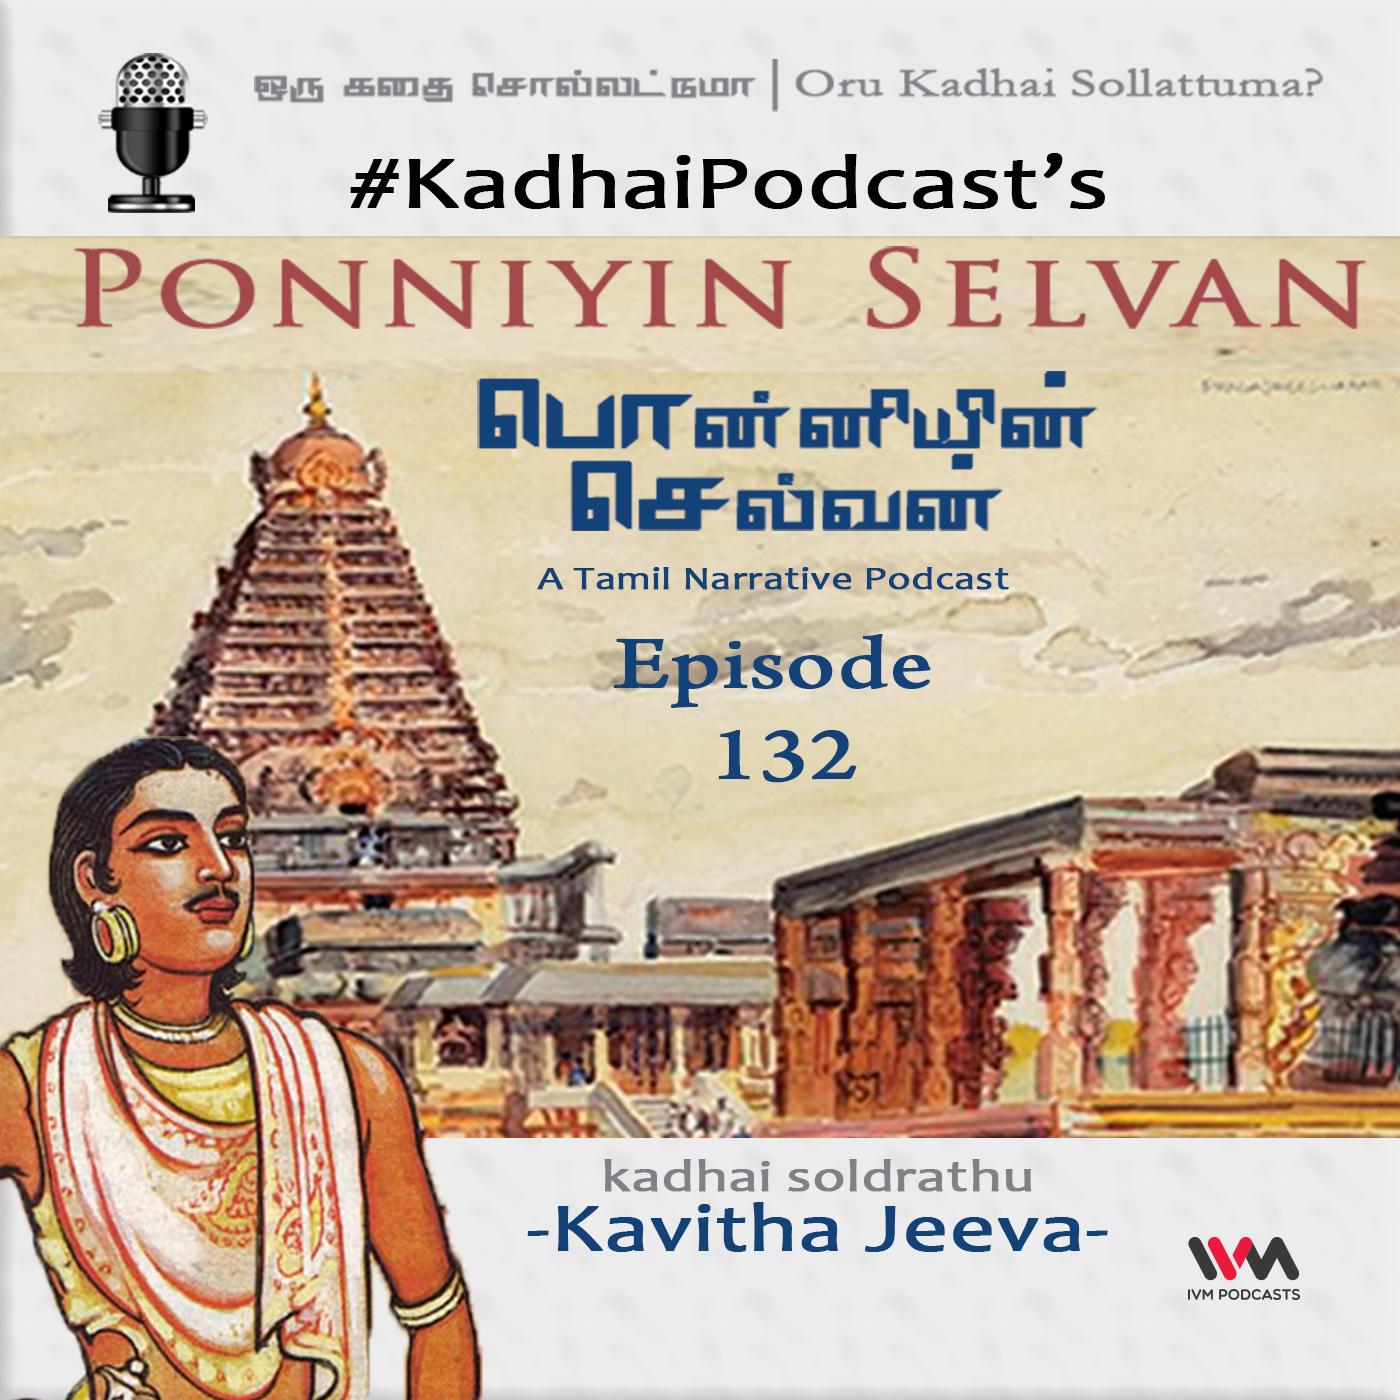 KadhaiPodcast's Ponniyin Selvan - Episode # 132